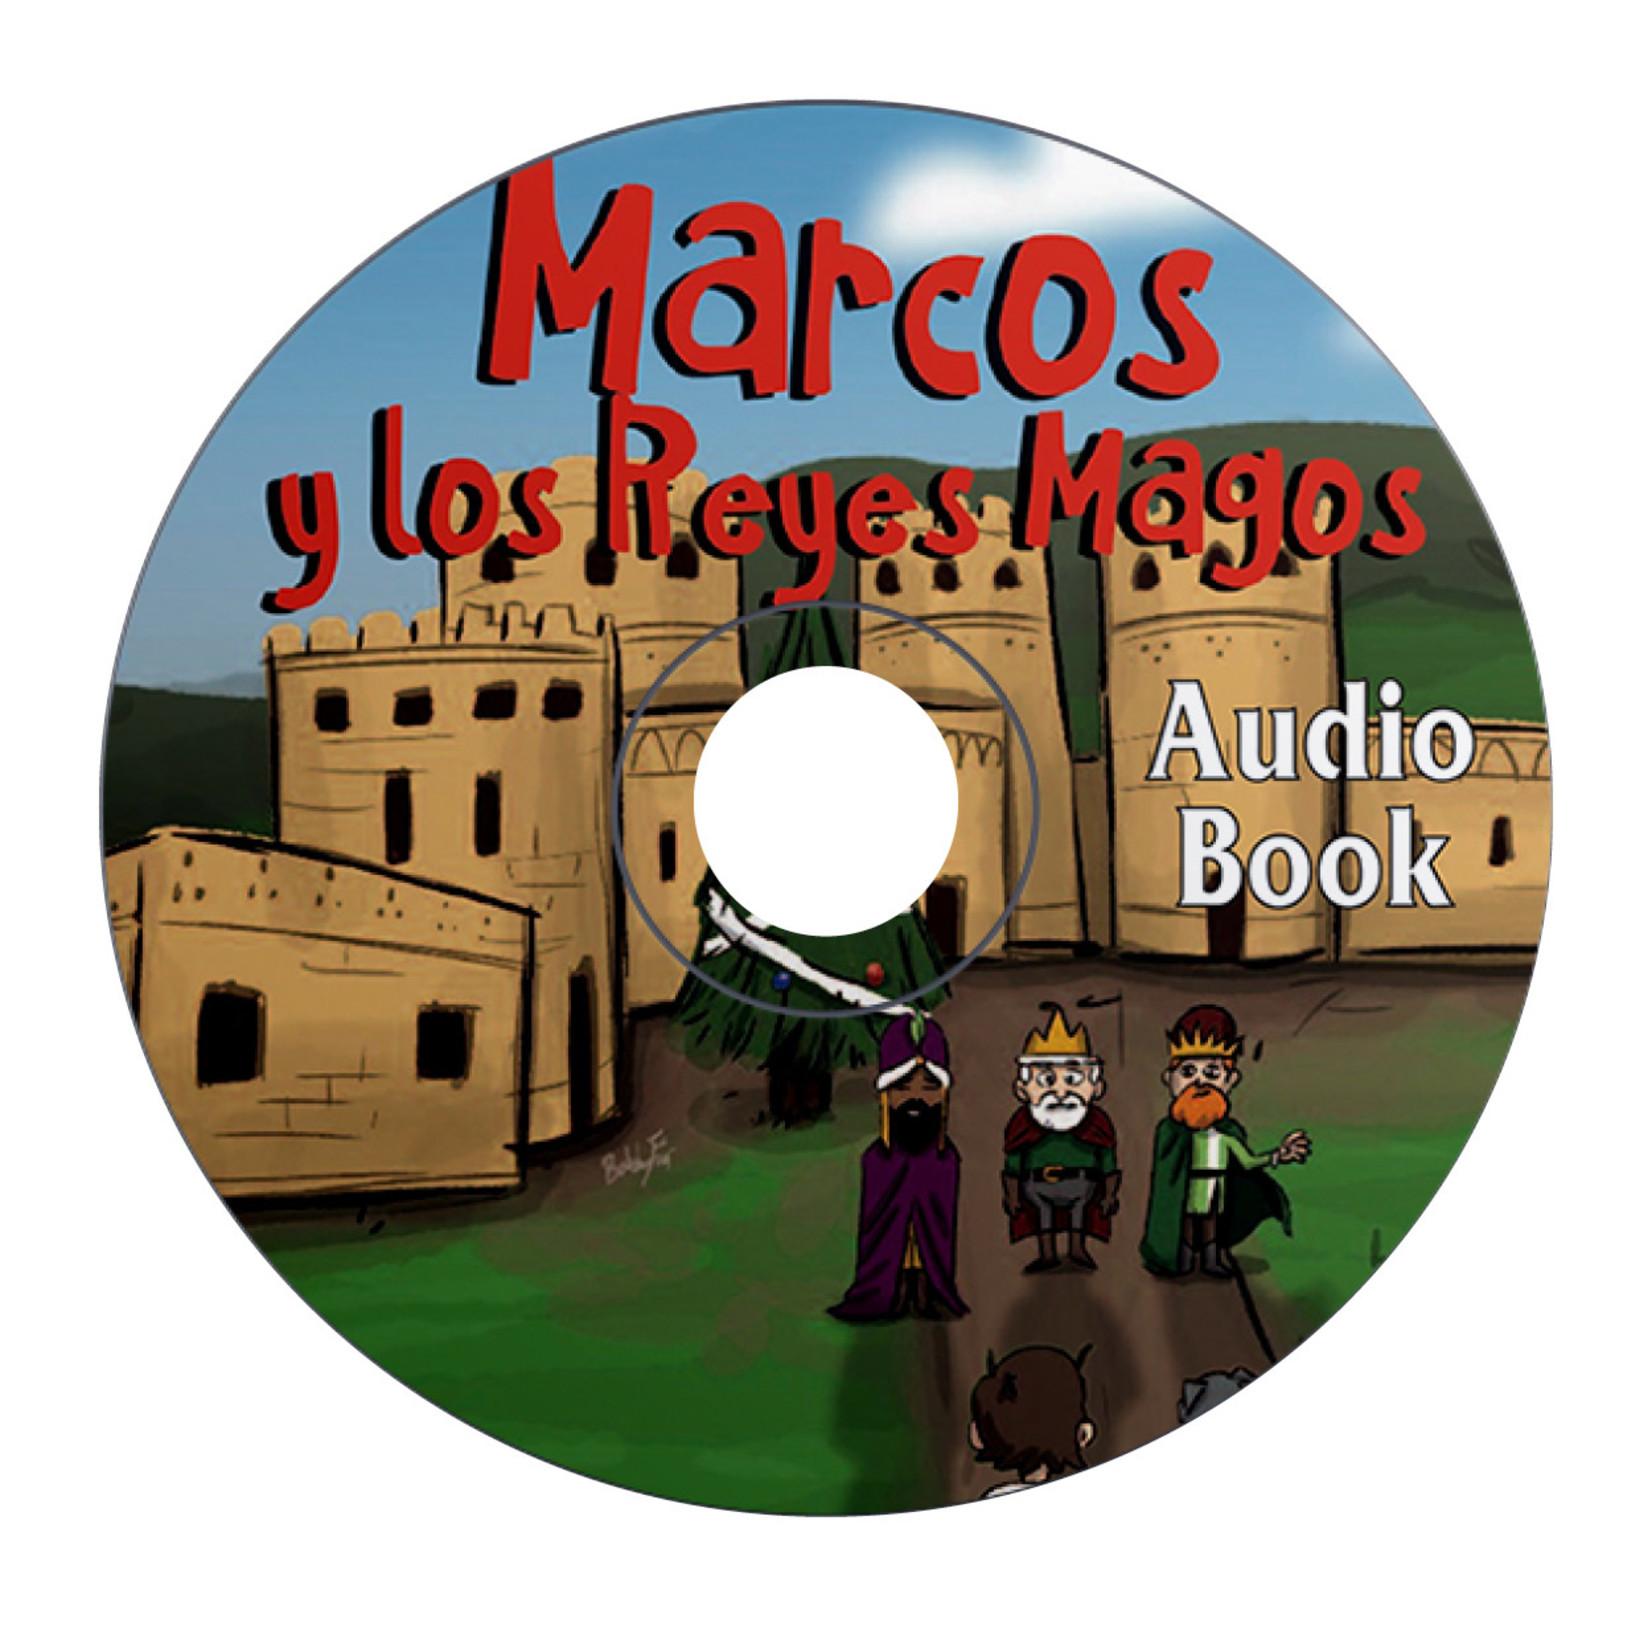 Fluency Matters Marcos y los Reyes Magos - Audiobook